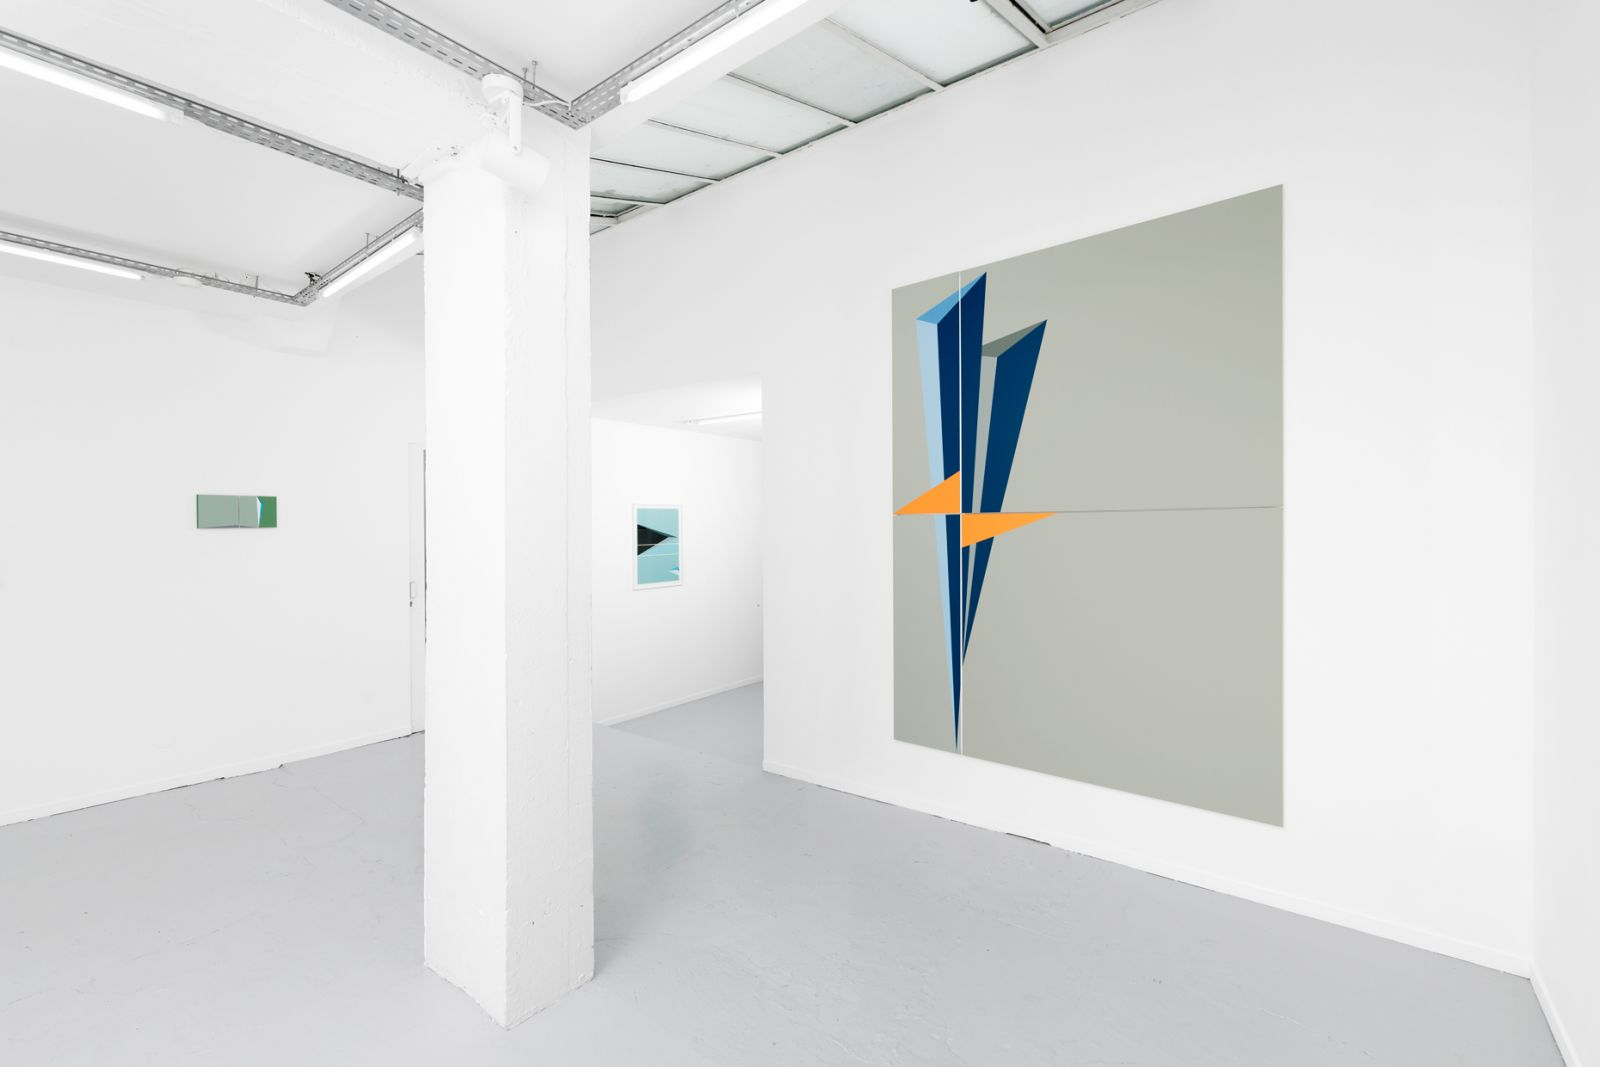 00-parties-fines-progress-gallery-vue-expo-3-aurelien-mole-web-a59ab7f1248923befbbbd7e315d6c0c2